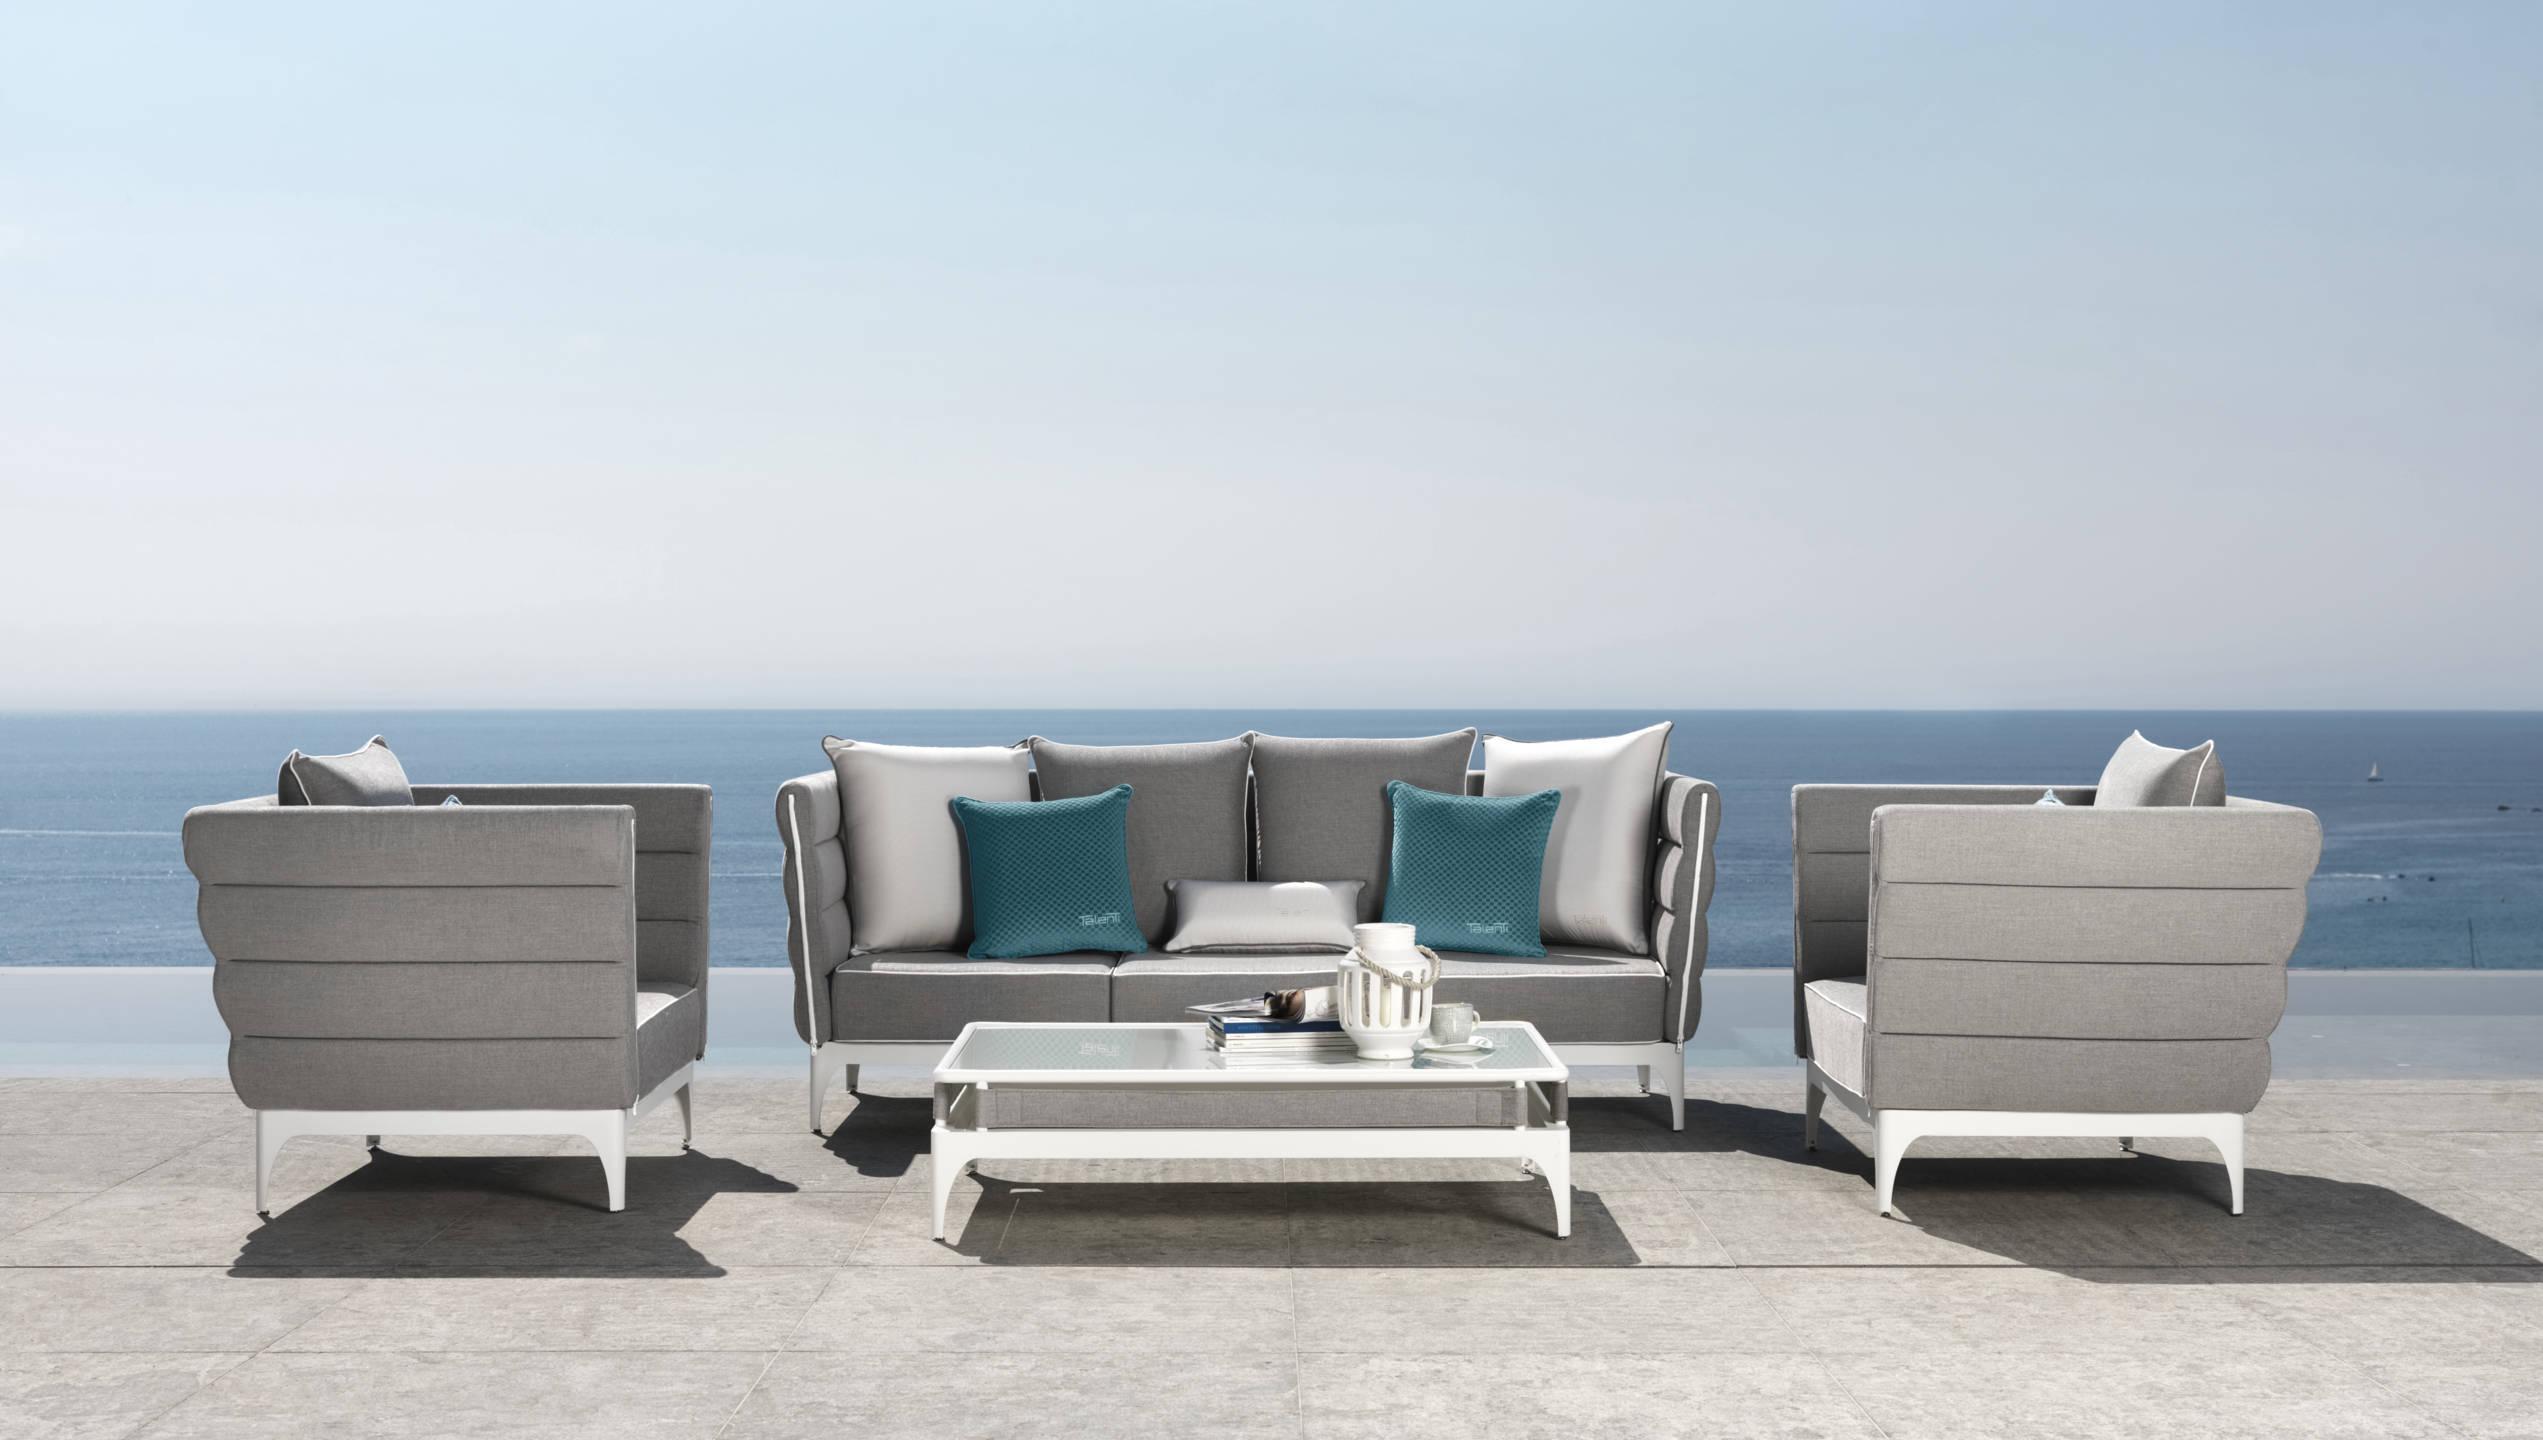 Divani Per Esterni Vendita On Line : Vivereverde divano padcollection divani per esterno vendita